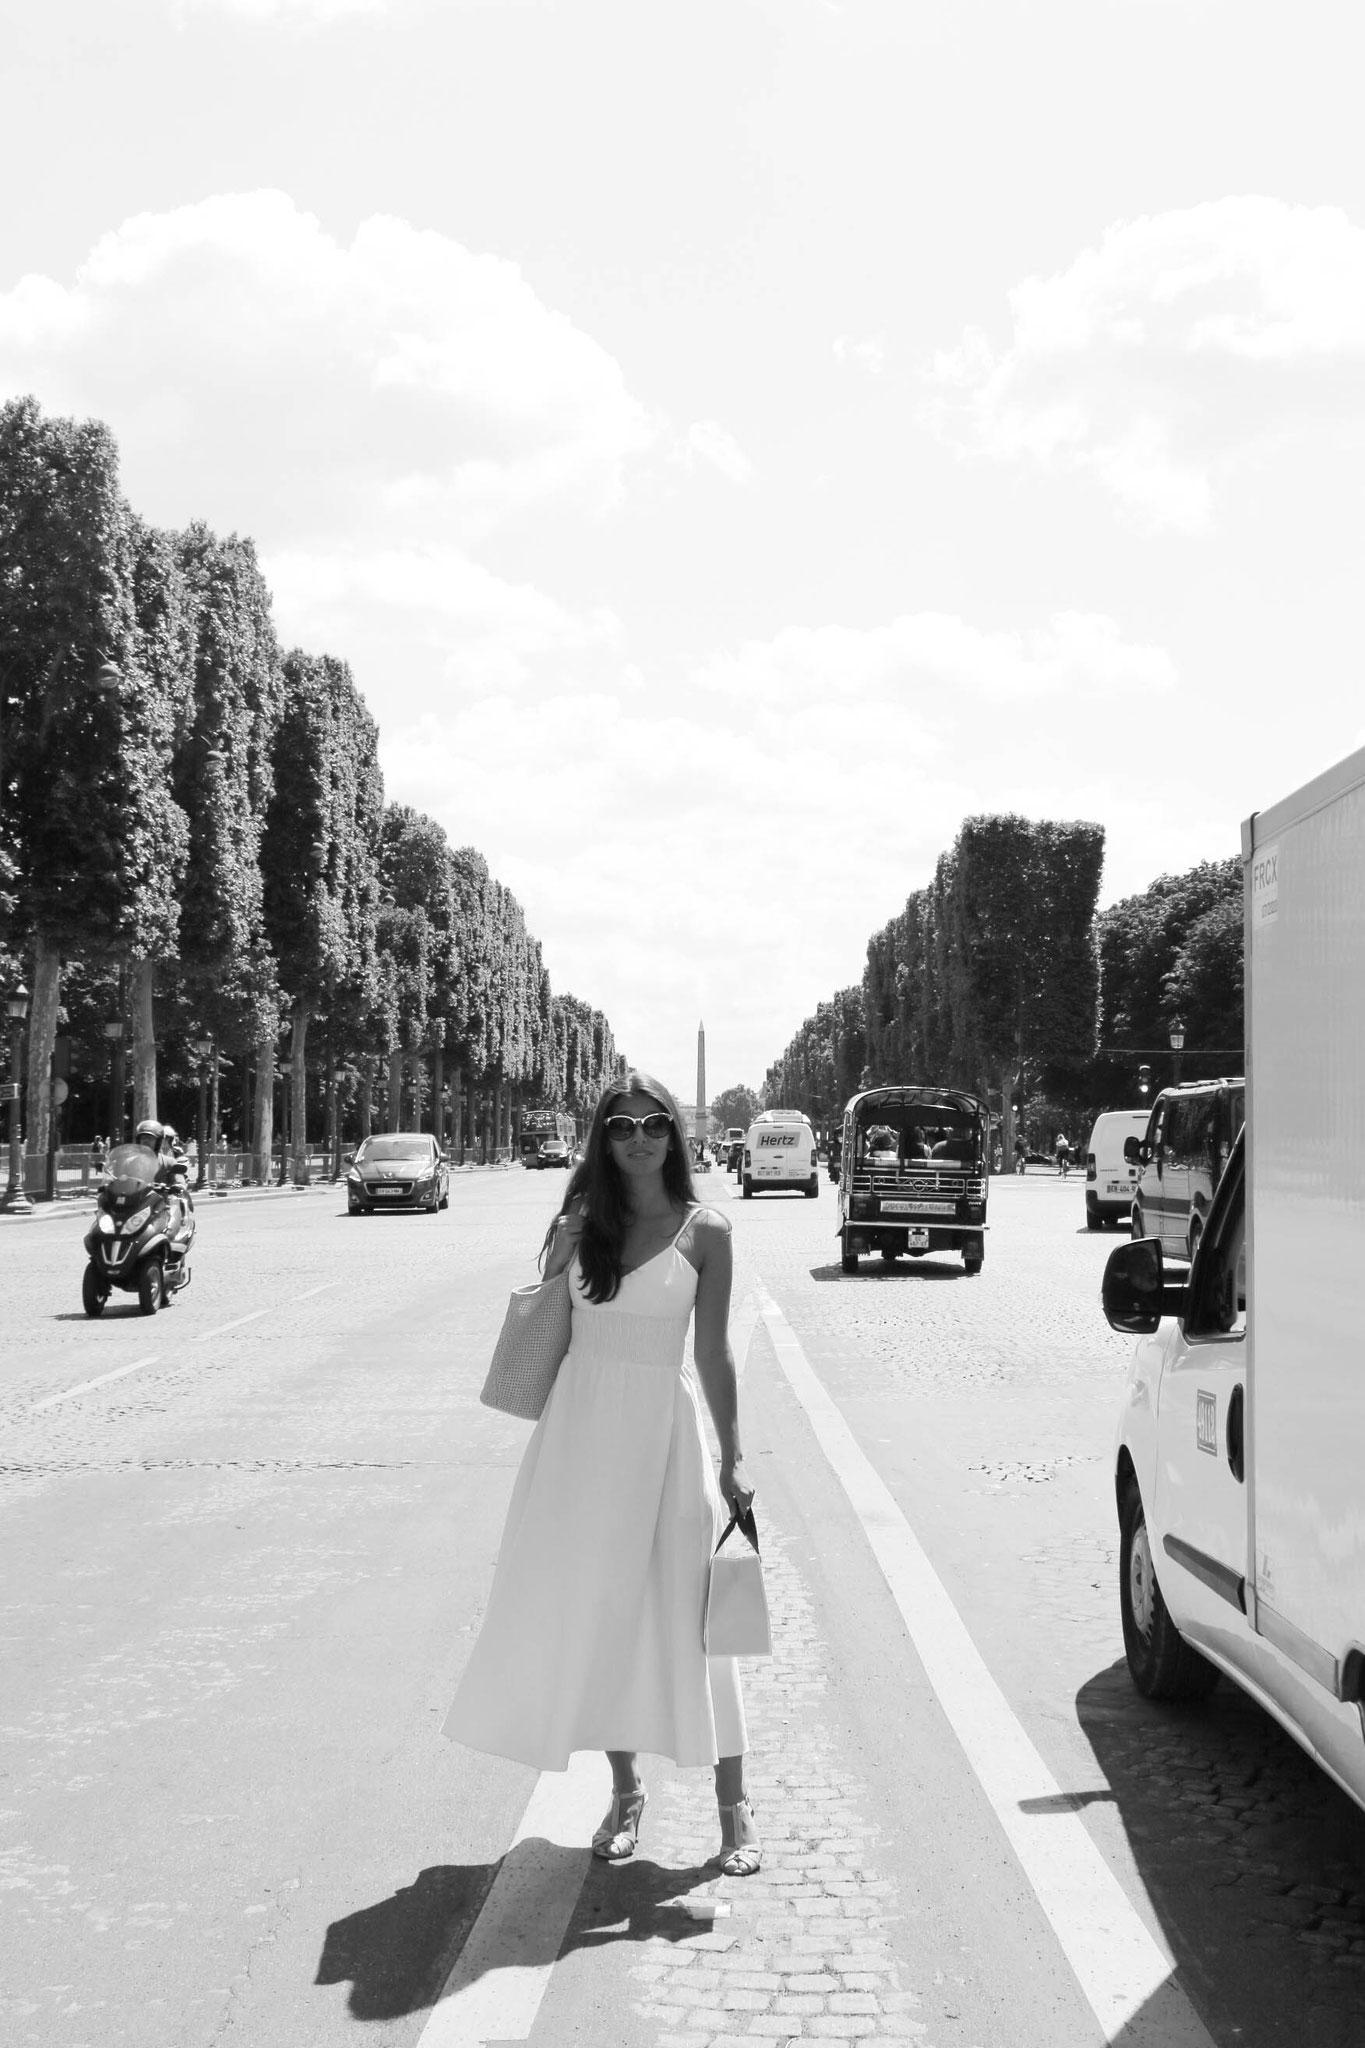 White Dress Paris Champs Elysees, Carmen Schubert